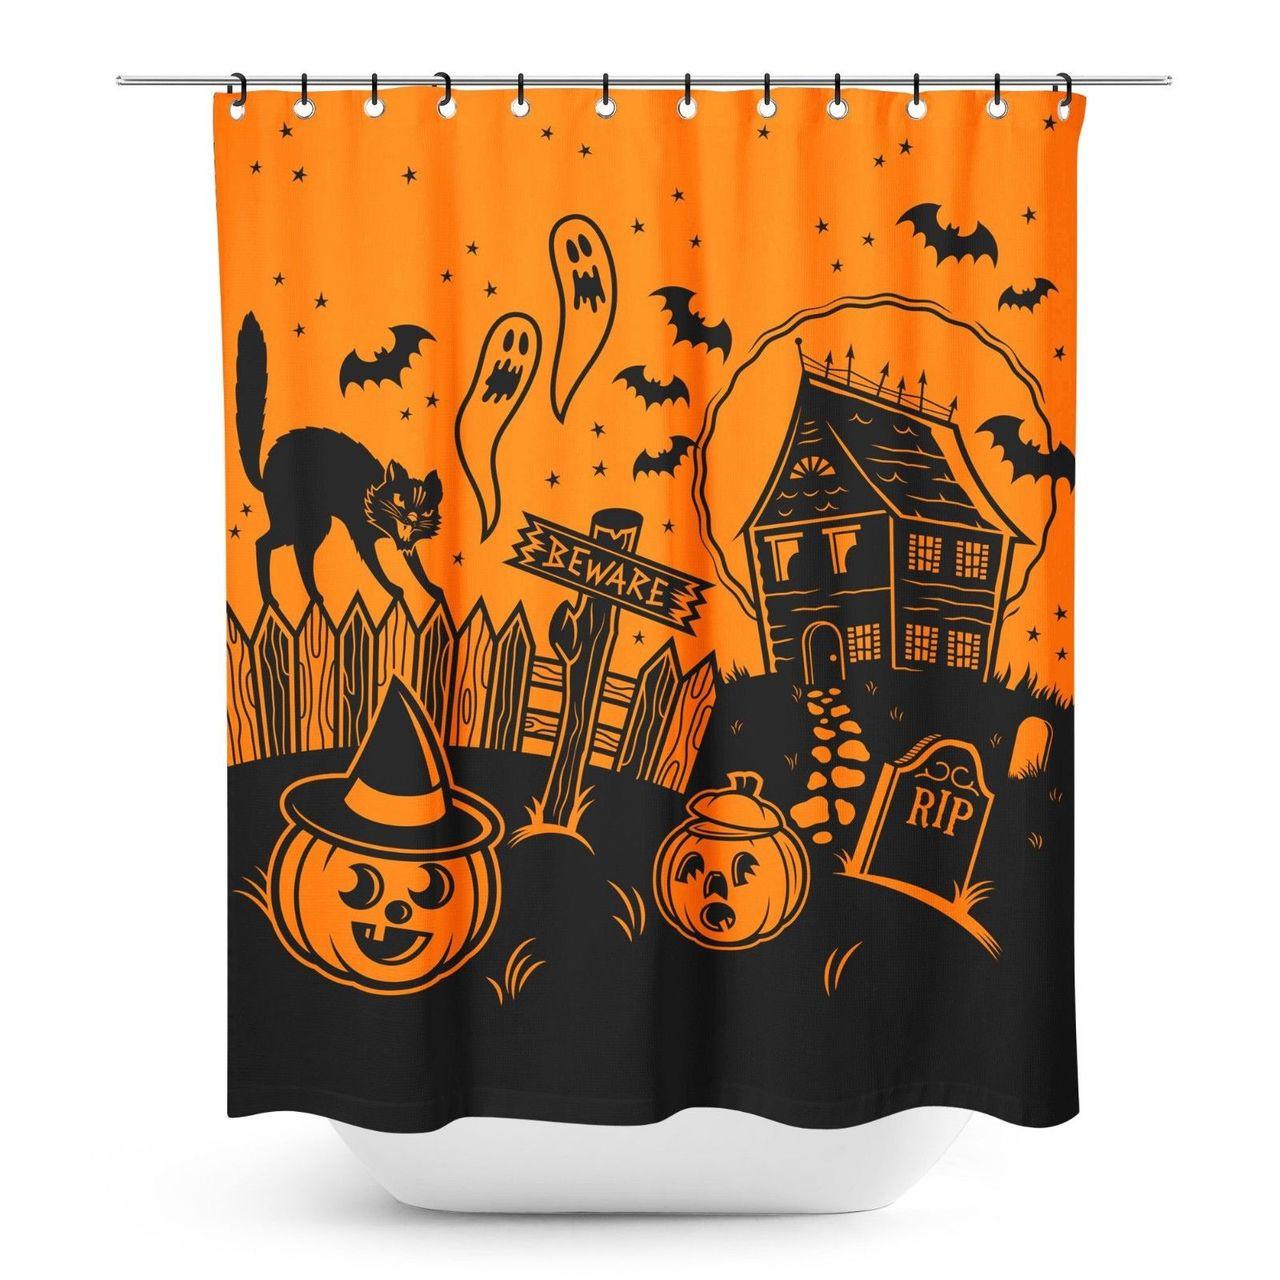 Sourpuss Haunted House Halloween Spooky Gothic Punk Horror Shower Curtain SPSC26